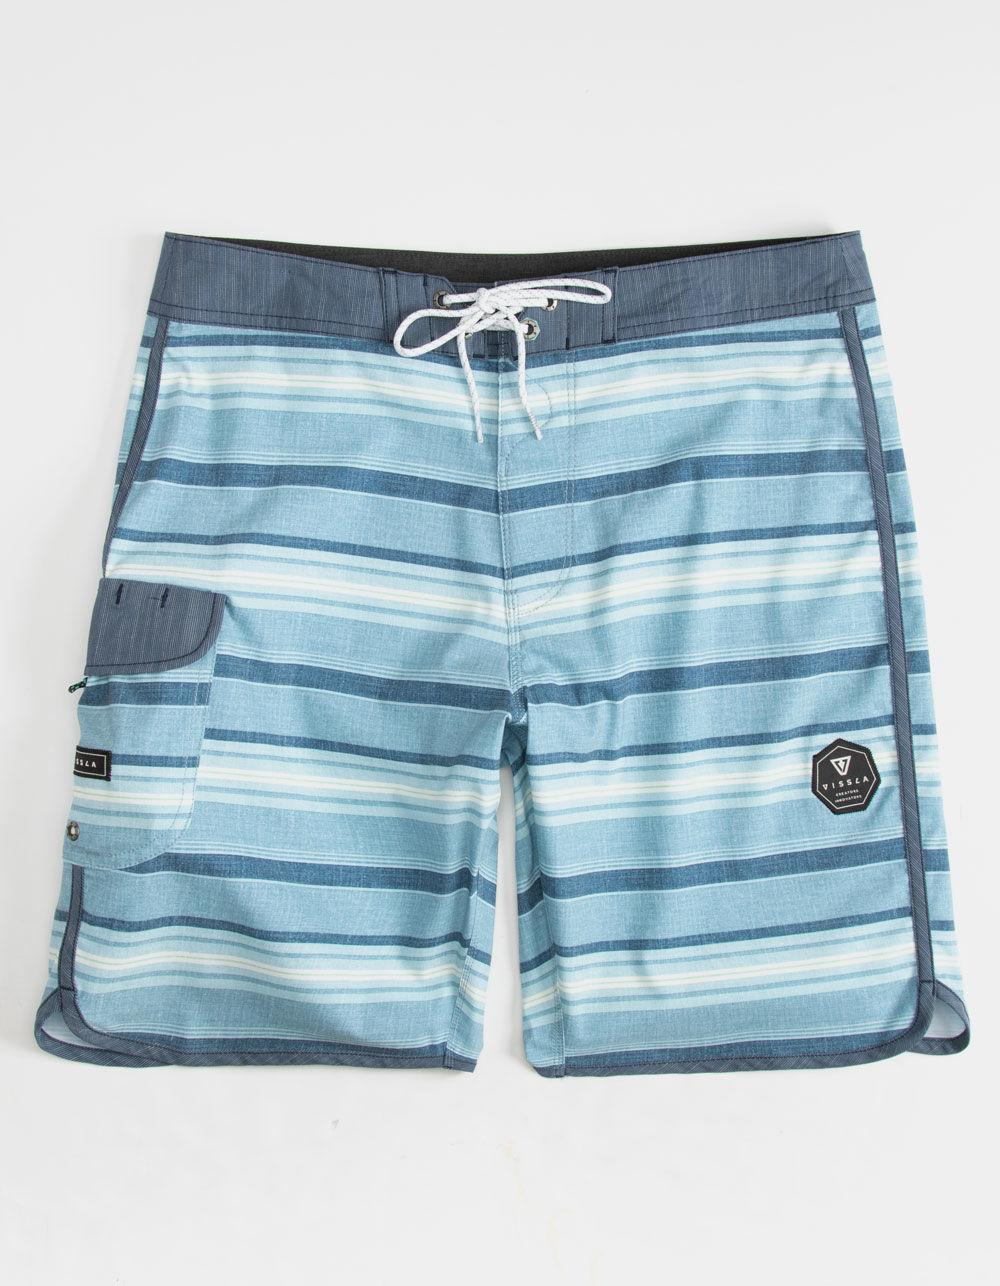 978781e89f Lyst - Vissla Tiger Tracks Mens Boardshorts in Blue for Men